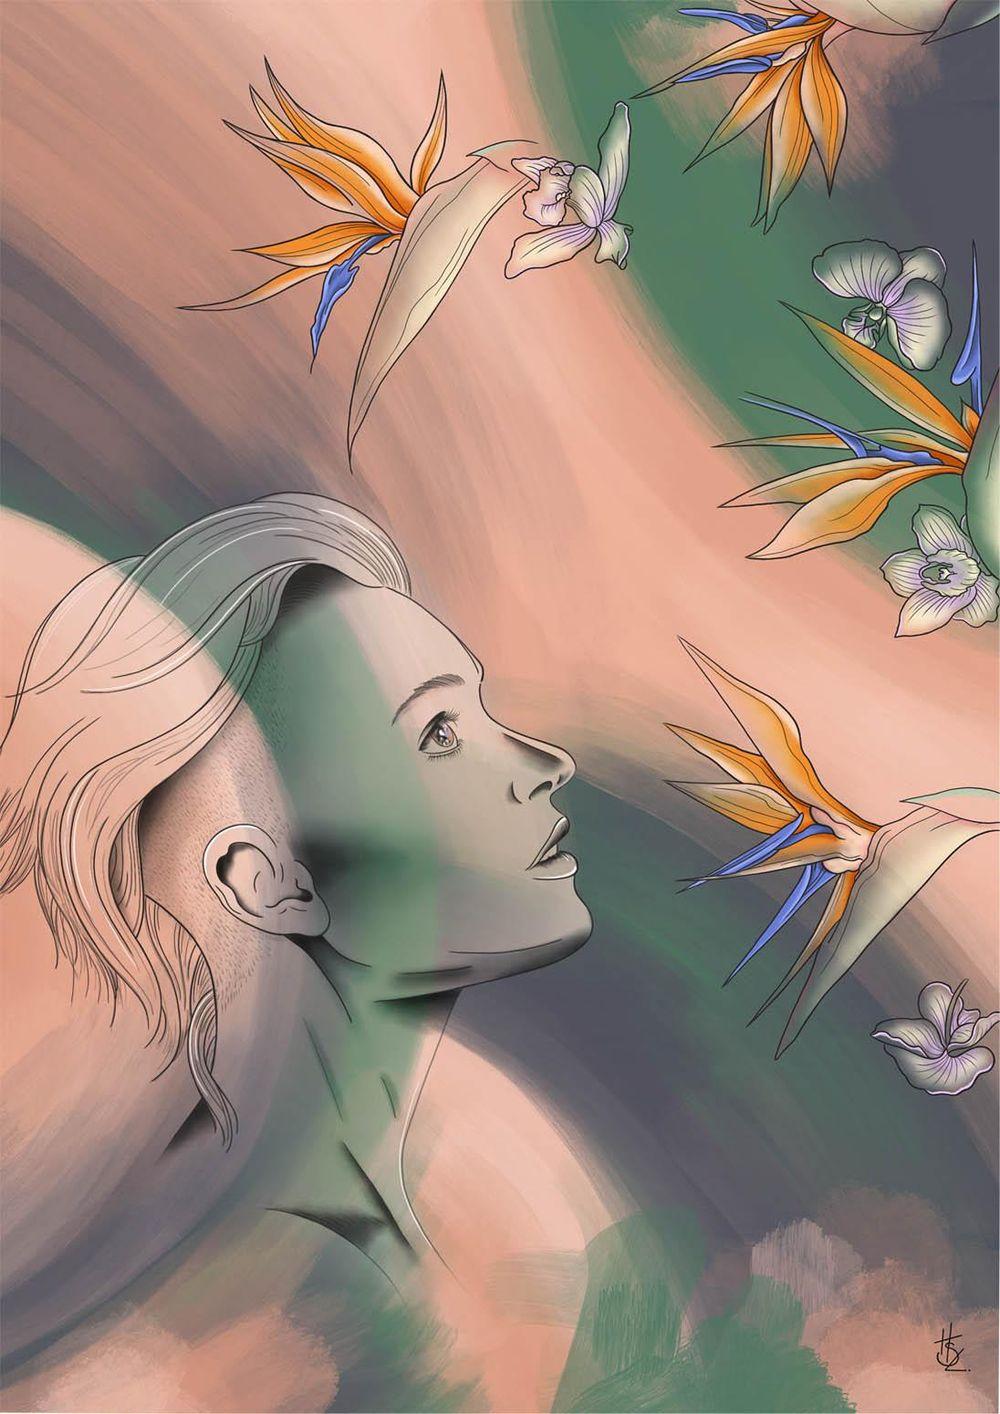 Intro & Goals (Digital Illustration) - image 4 - student project